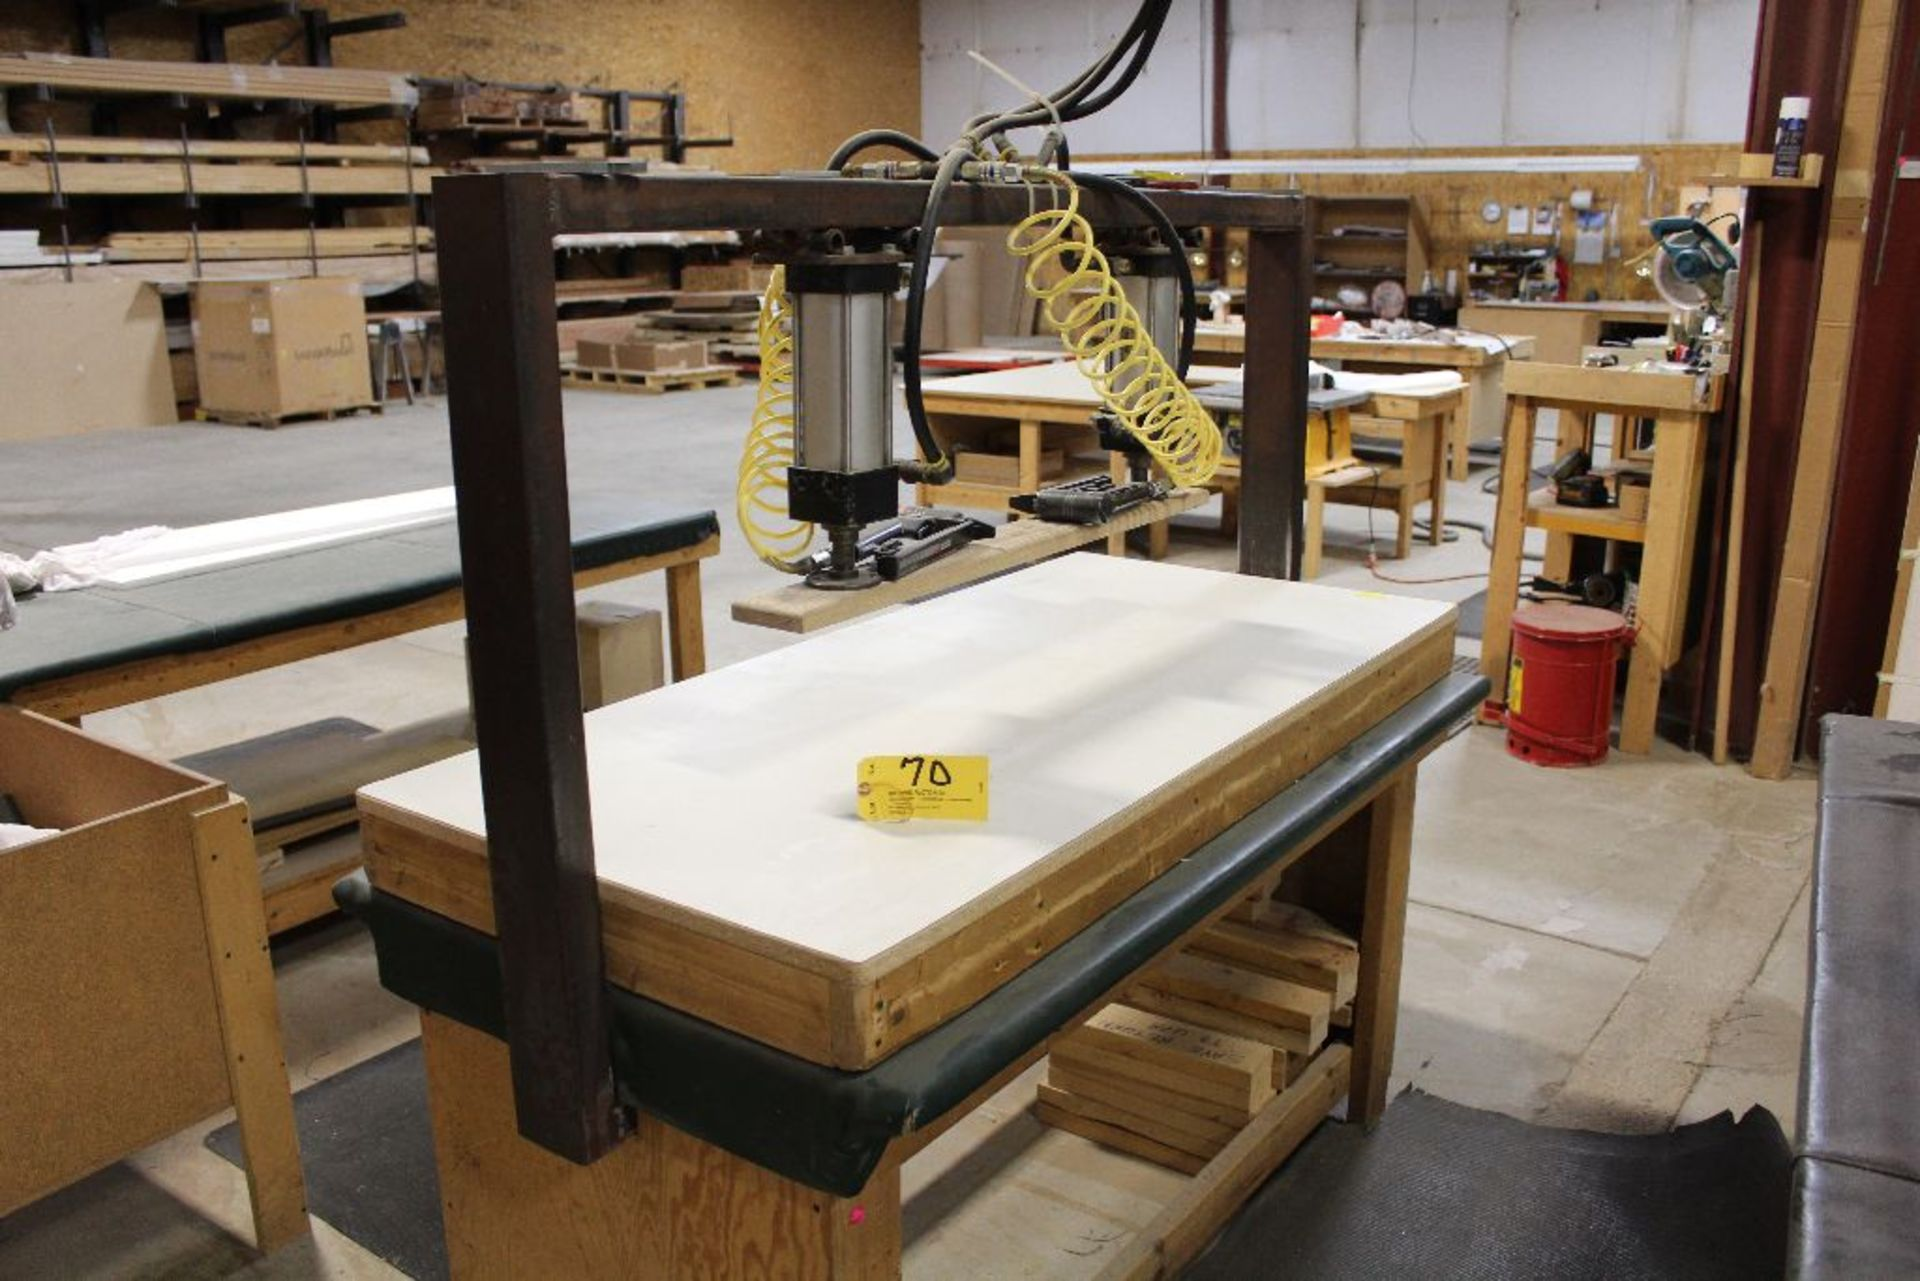 "Lot 070 - Twin pnuematic cylinder press for foam cushion fabric installation, shopmade, 60"" x 28"" x 36"", w/2"